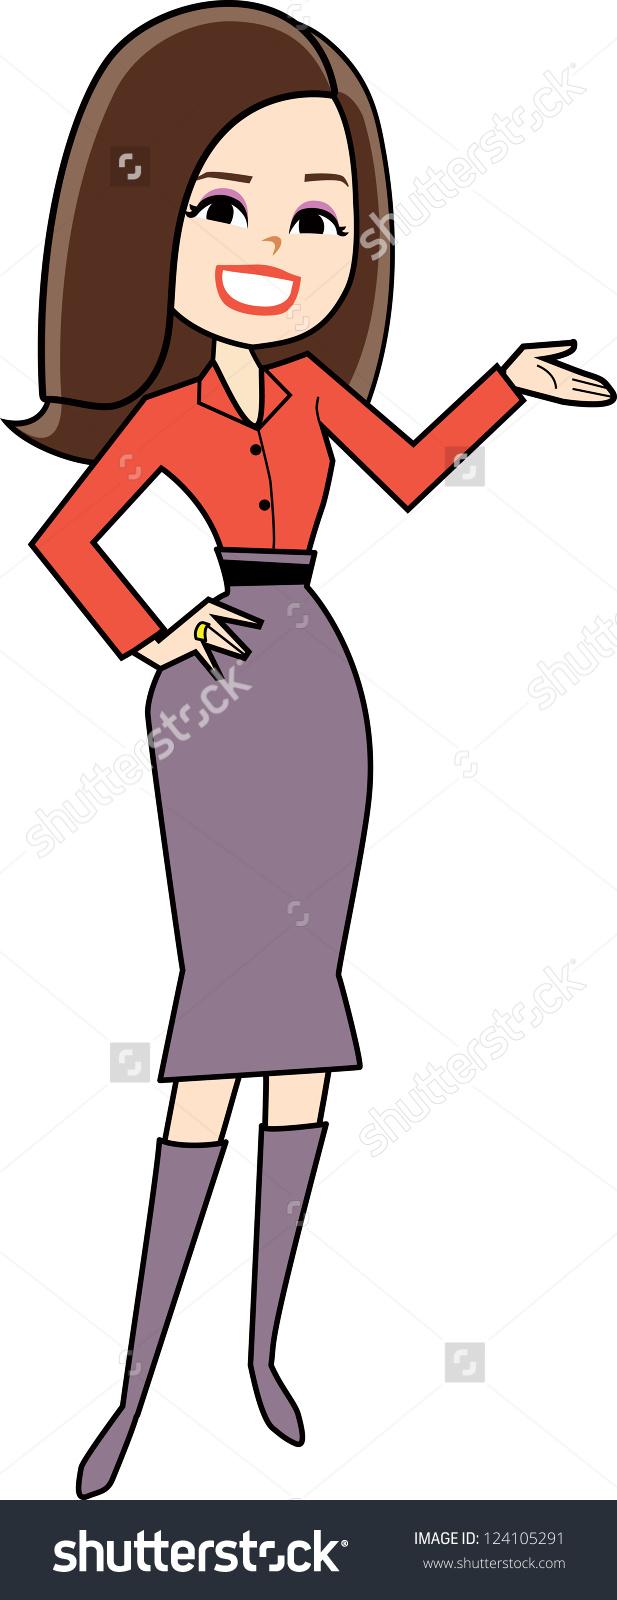 Cartoon Woman Clipart Retro Style Drawing Stock Vector 124105291 .